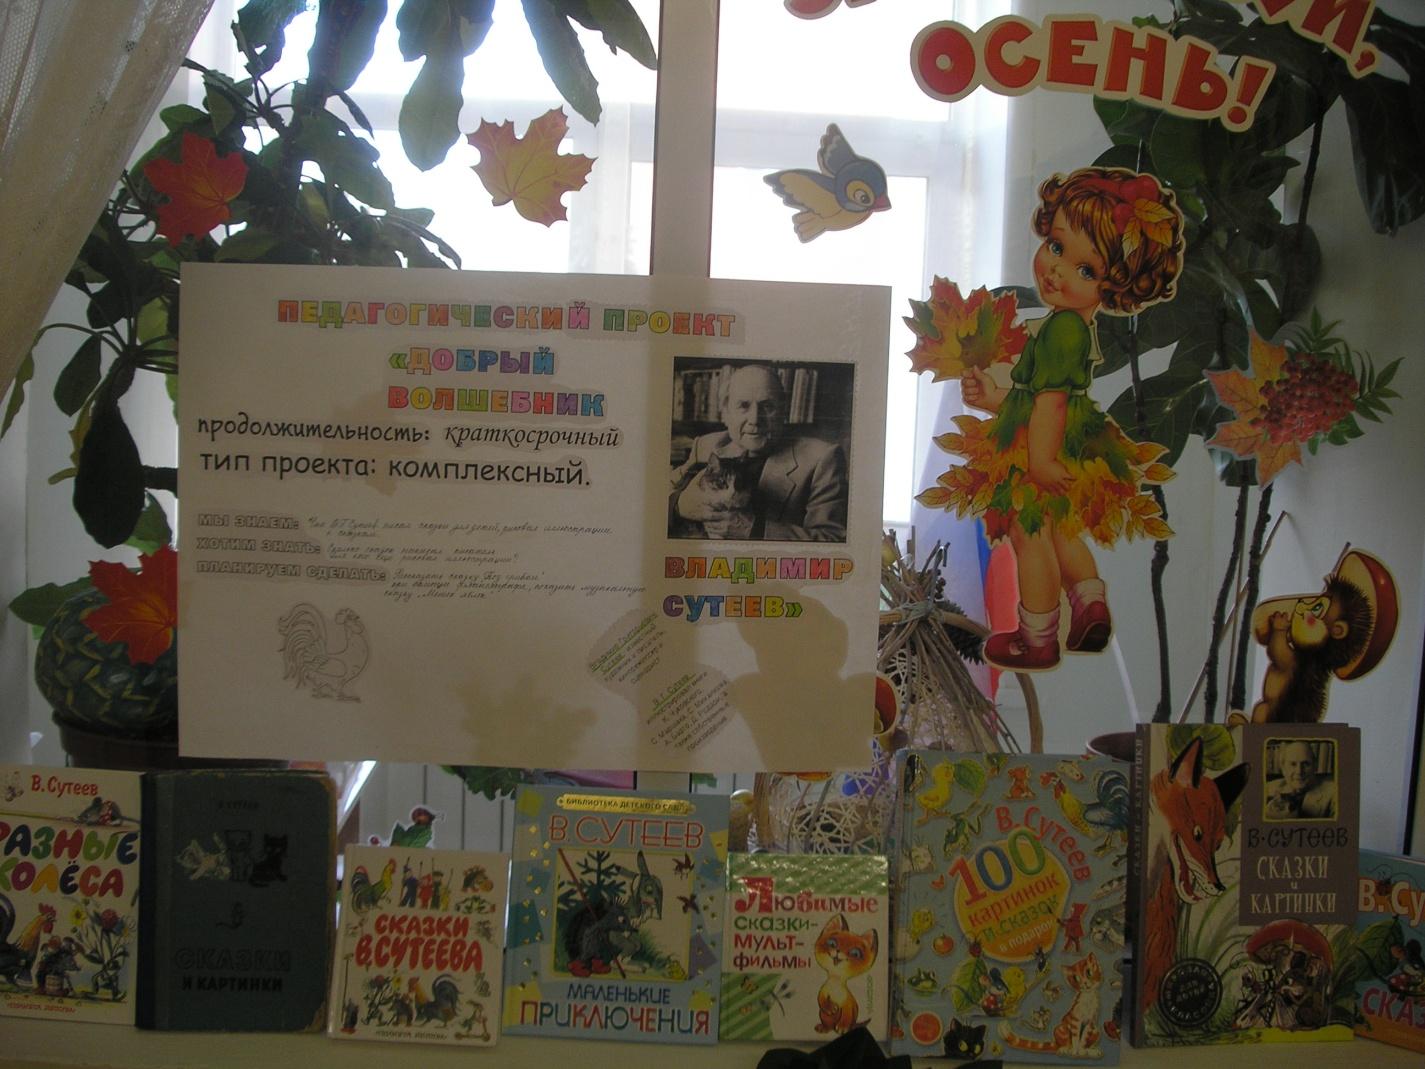 C:\Users\Natali\Desktop\по Сутееву\фото по сказкам Сутеева\P1010024.JPG